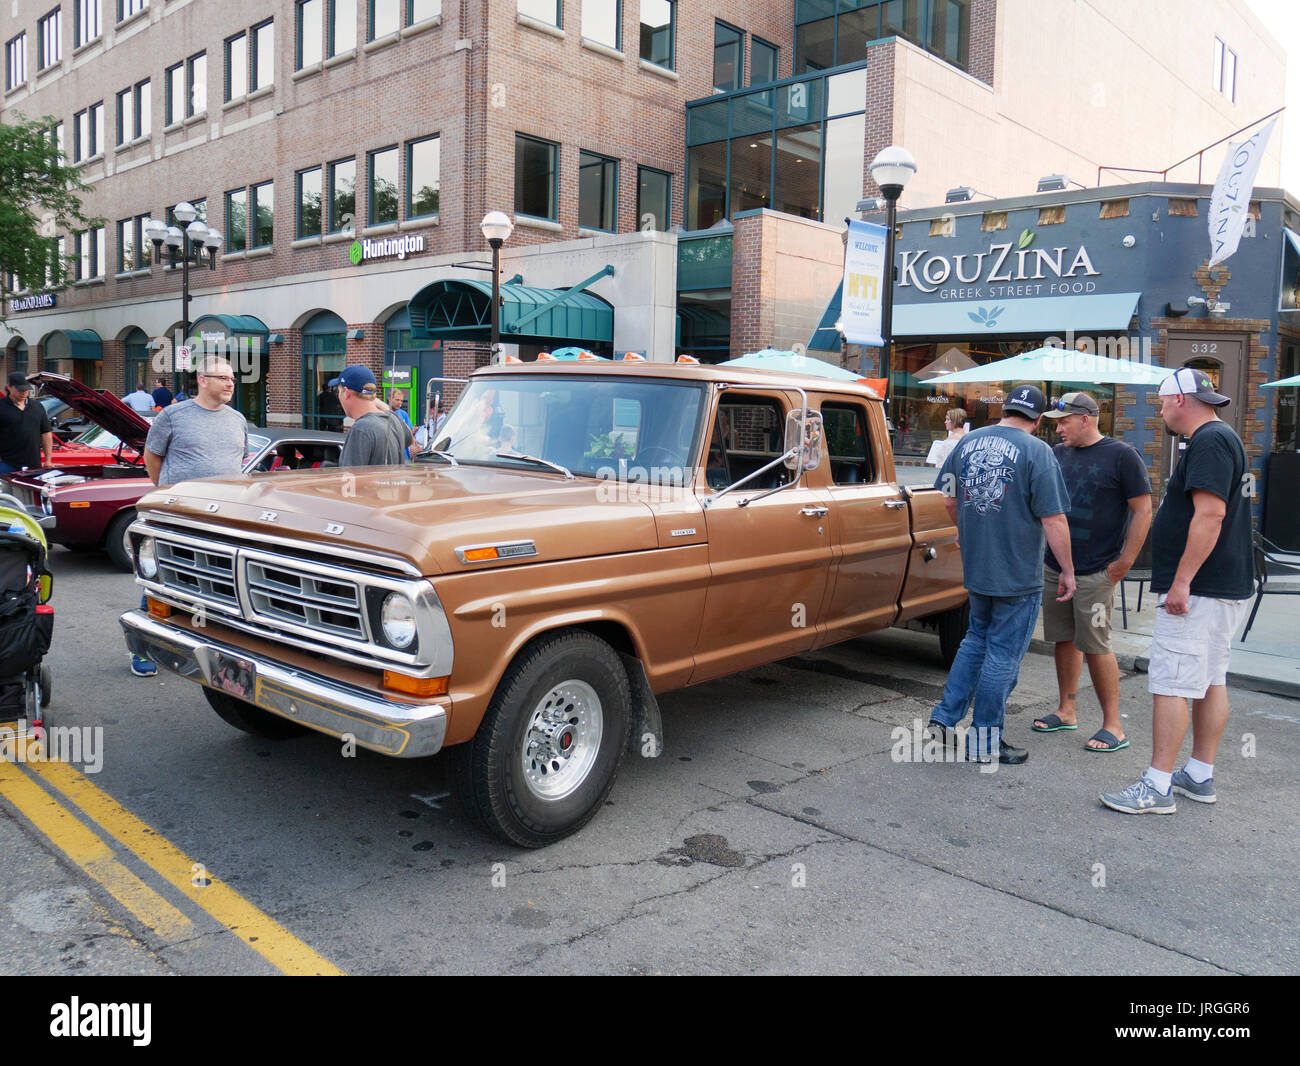 Ford F350 Stockfotos Bilder Alamy 1964 Crew Cab 1972 Vintage F 350 Pickup Truck Stockbild